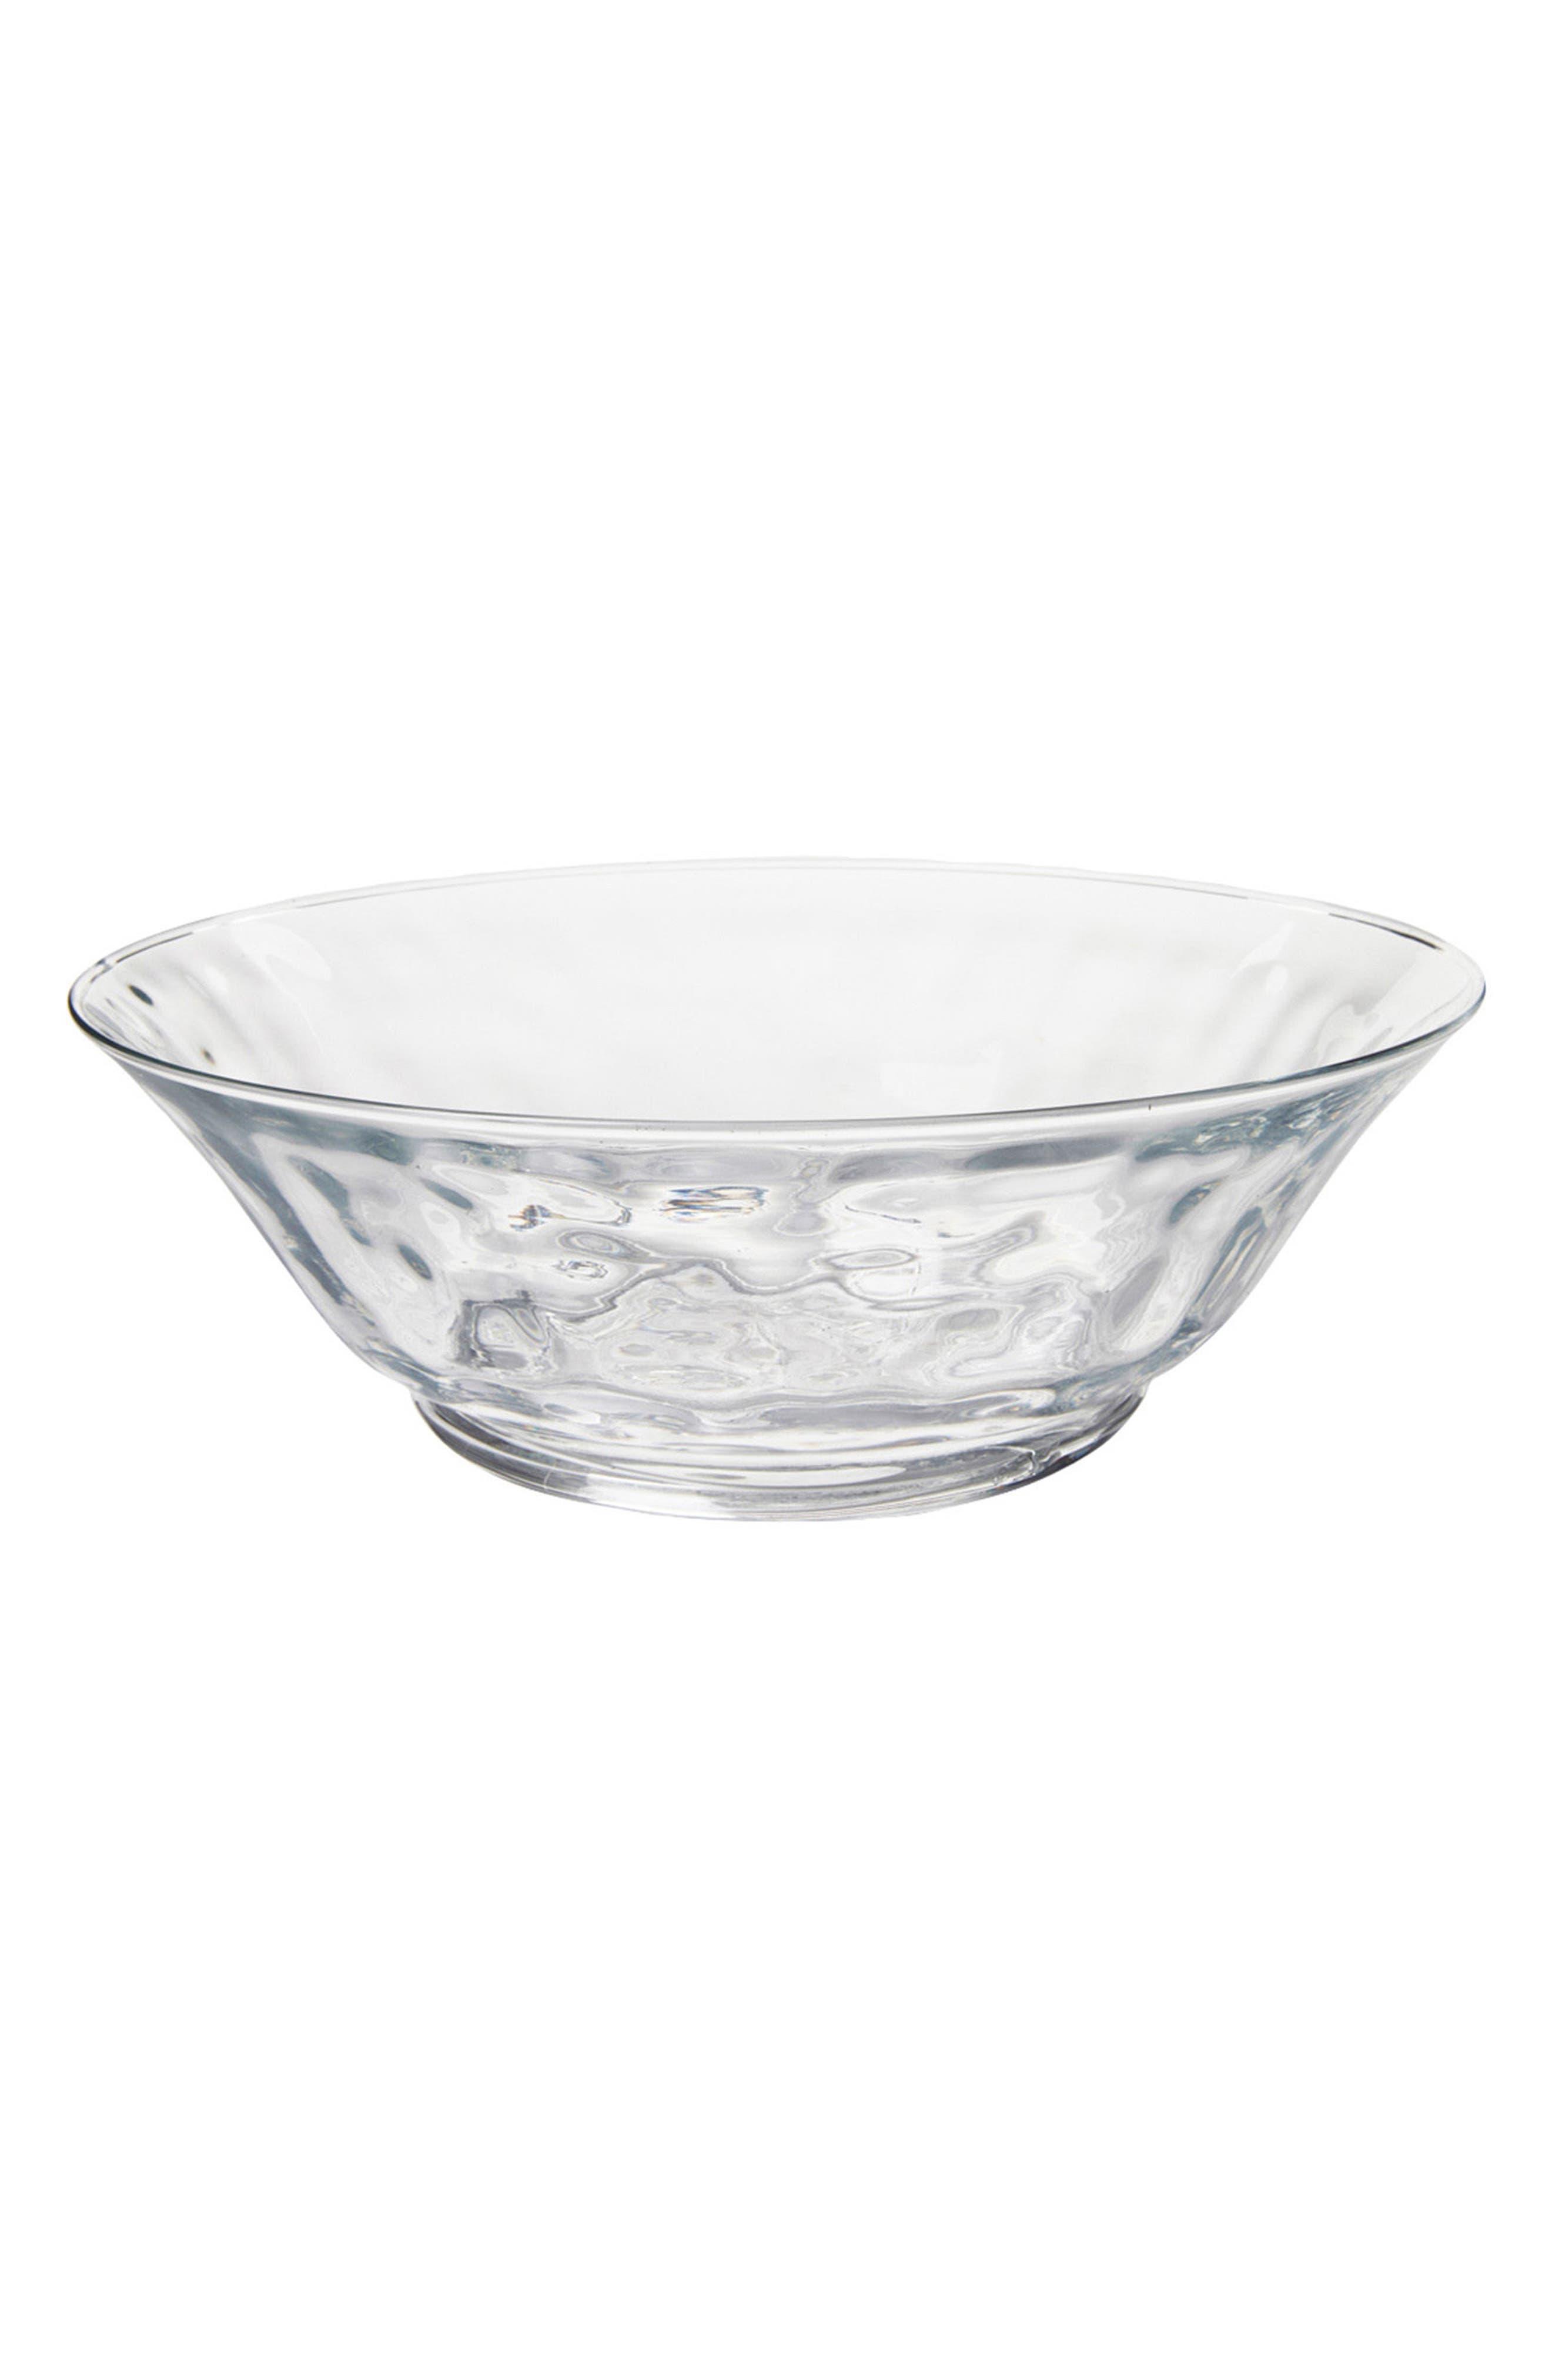 Carine Bowl,                             Main thumbnail 1, color,                             CLEAR